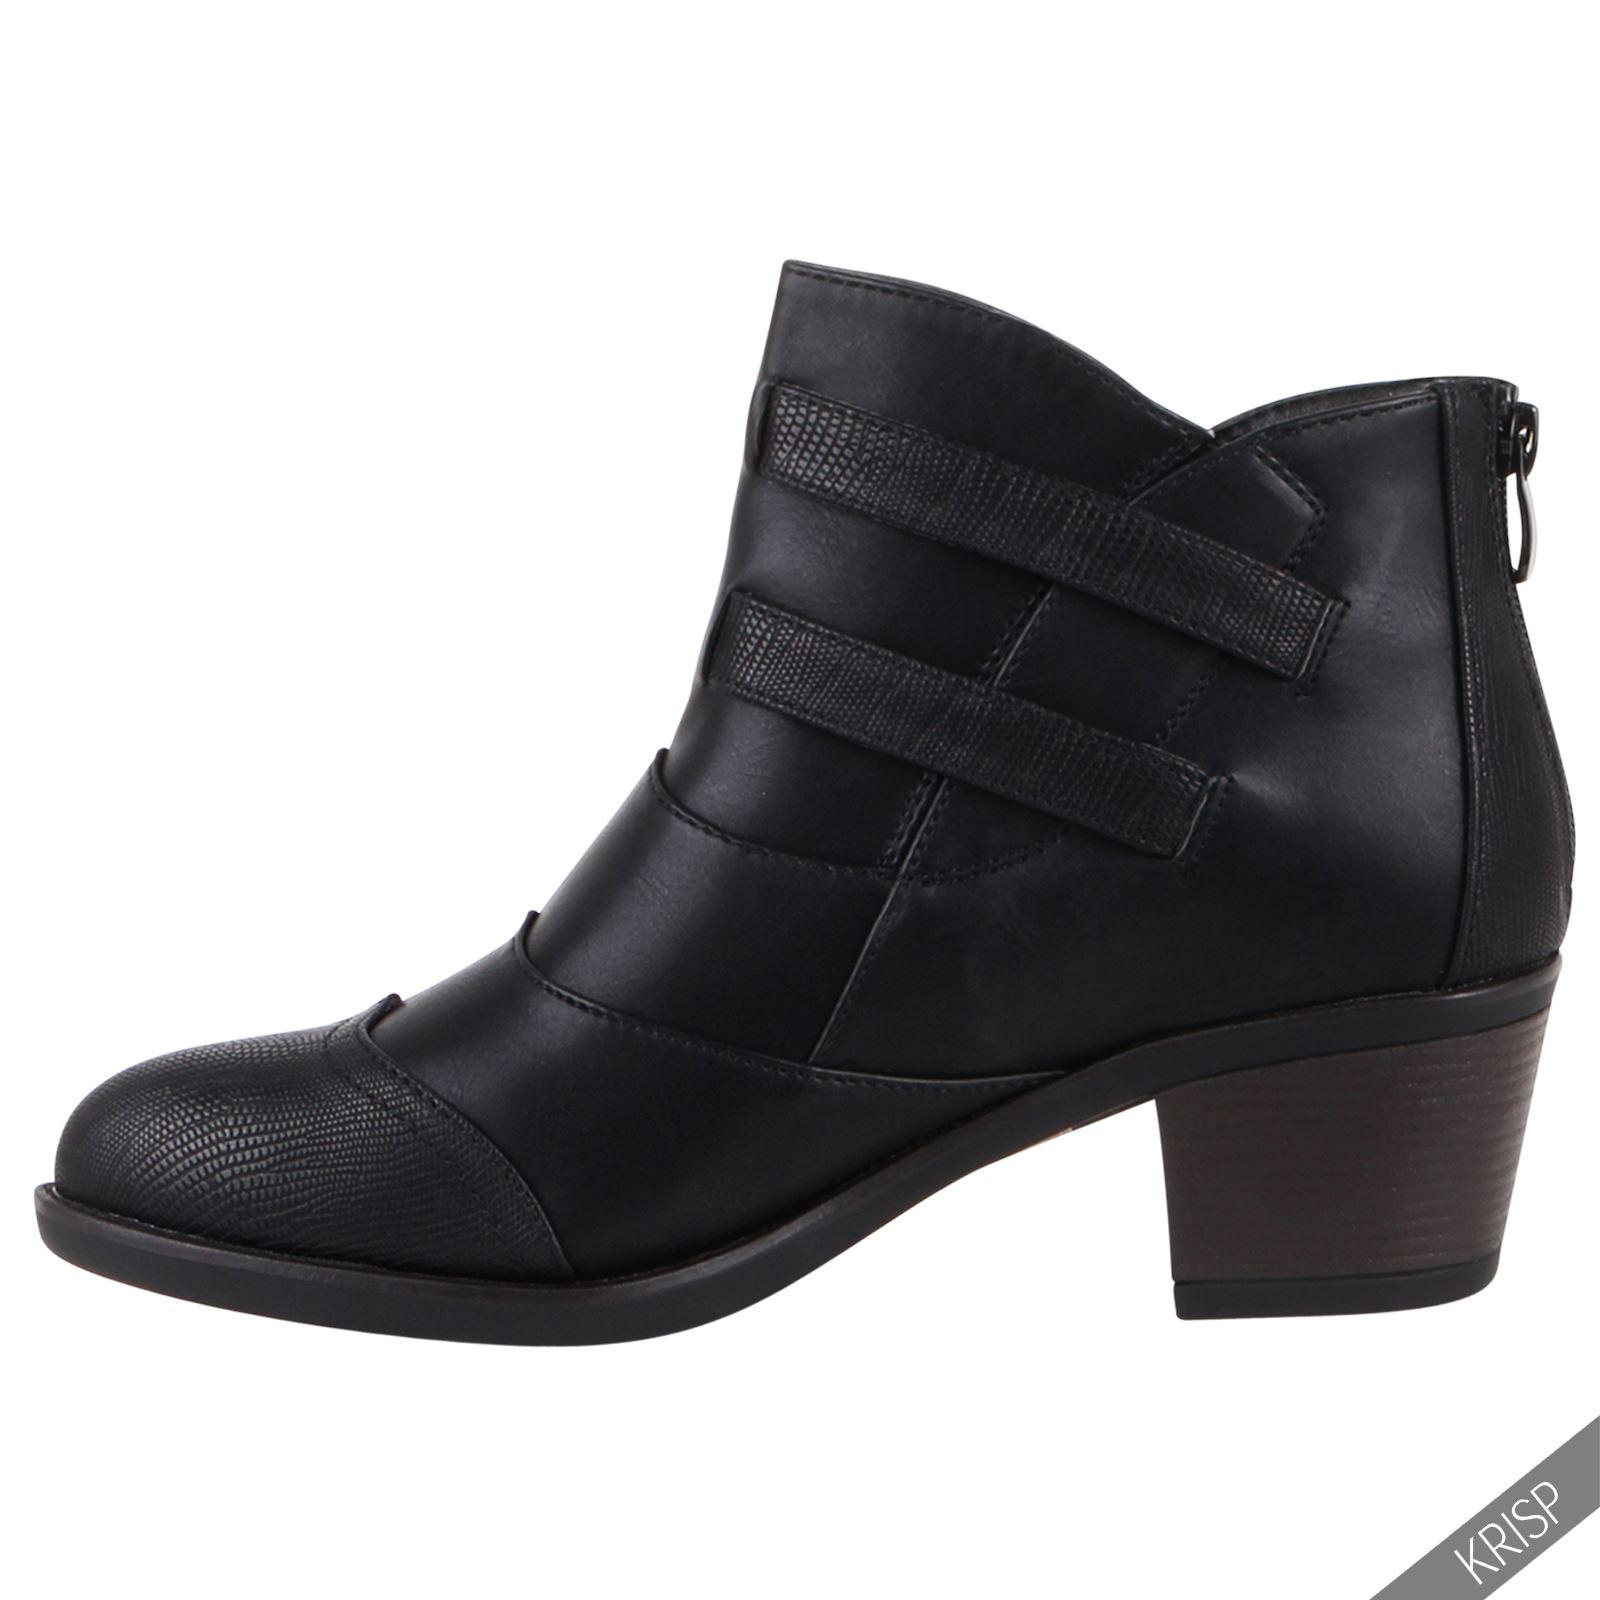 Excellent  McCartney Women 39Elyse39 Brogue Ankle Boots Womens Boots Sale 2iqi